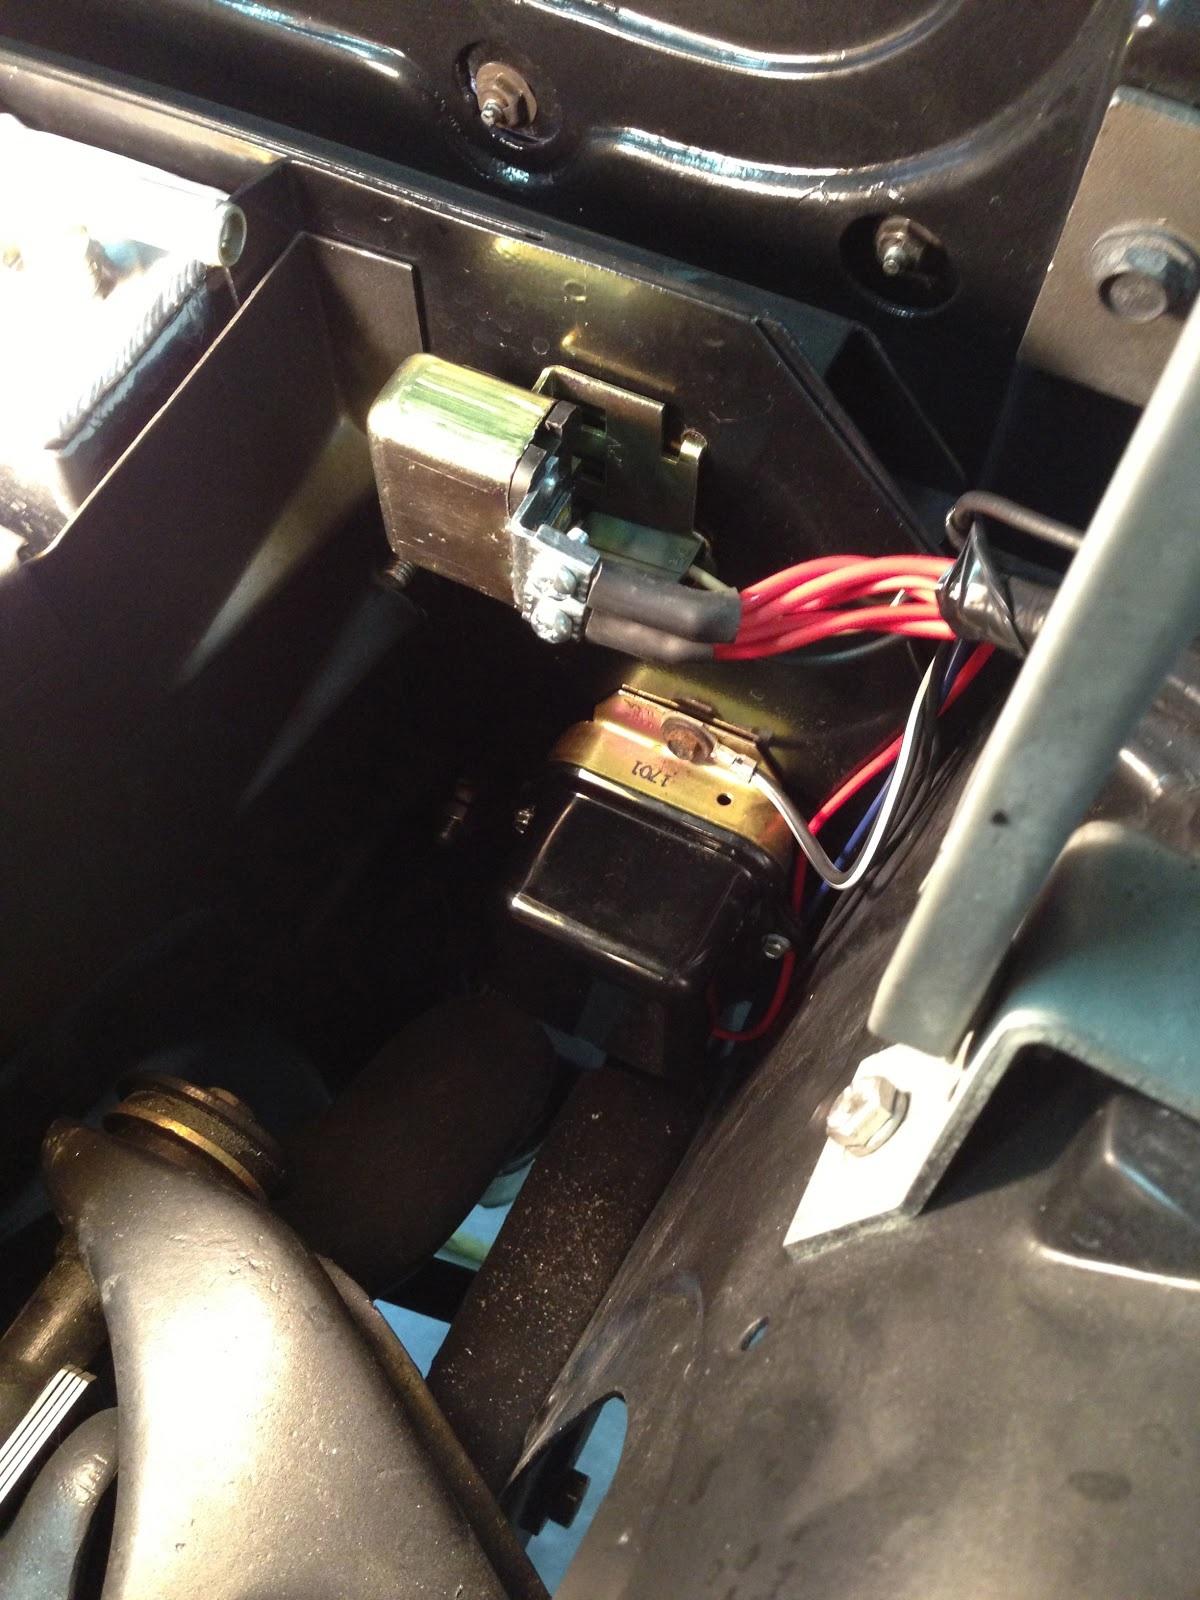 70 Corvette Horn Relay Wiring Diagrams Schematic Automobile 69 Camaro Diagram Blogs Simple 12v 1964 Chevelle